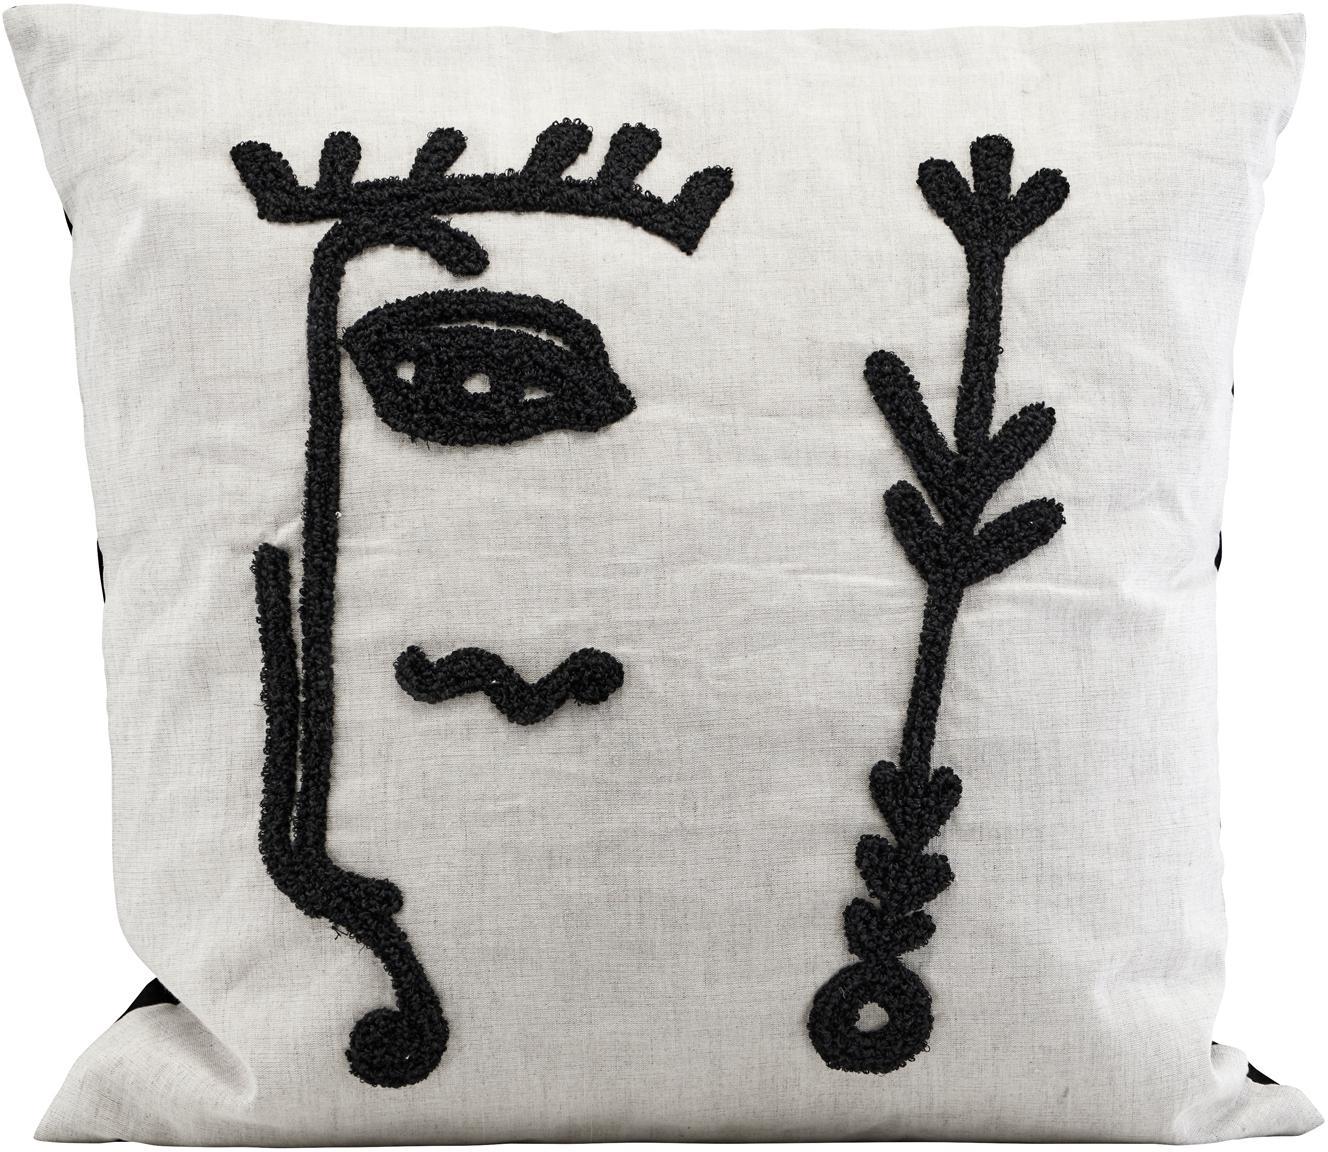 Kussenhoes Ingo, Wit, zwart, 50 x 50 cm